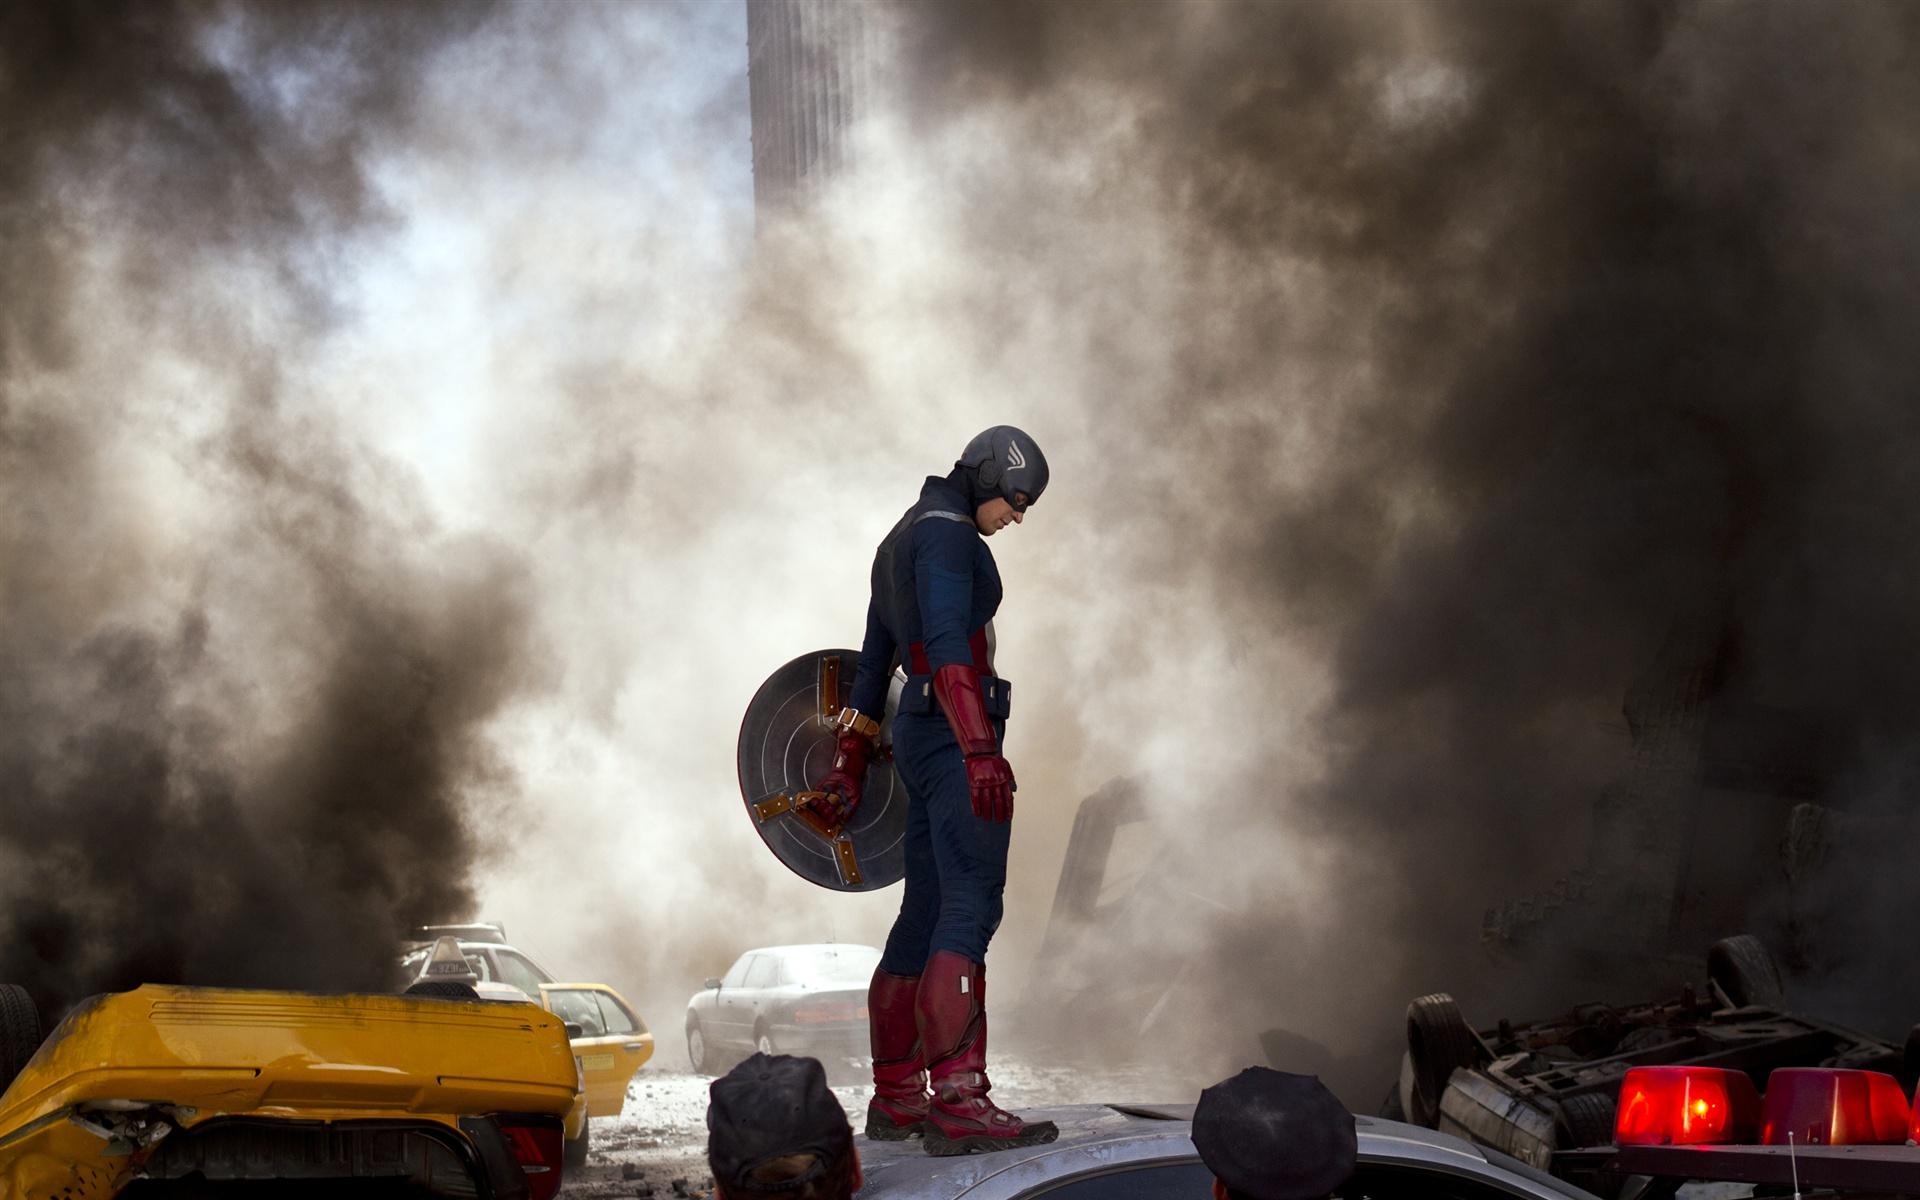 Captain-America-HD-p-wallpaper-wpc9003343